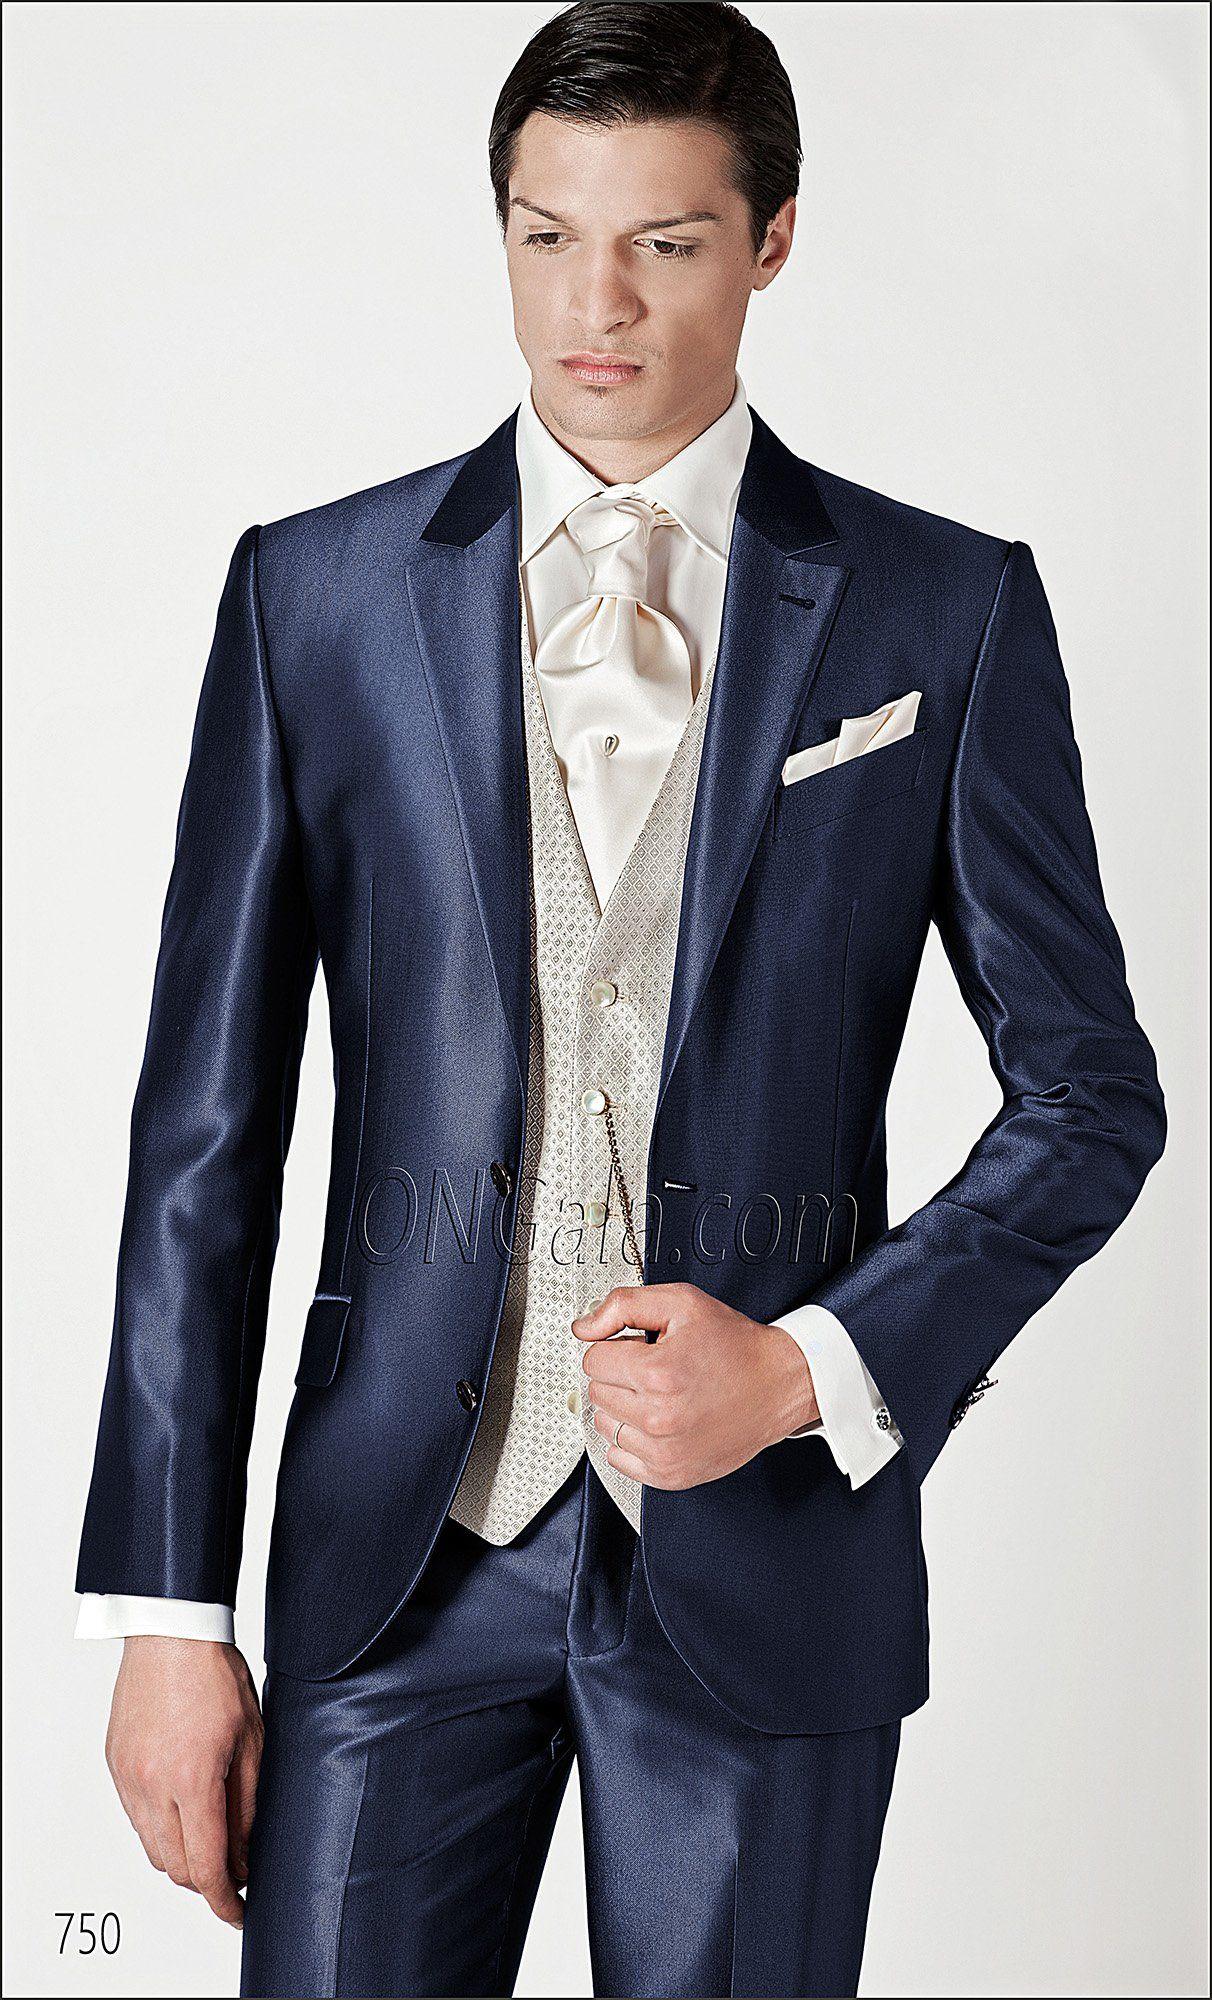 Ongala 750 Brautigam Anzug Blau Anzuge Hochzeit Pinterest